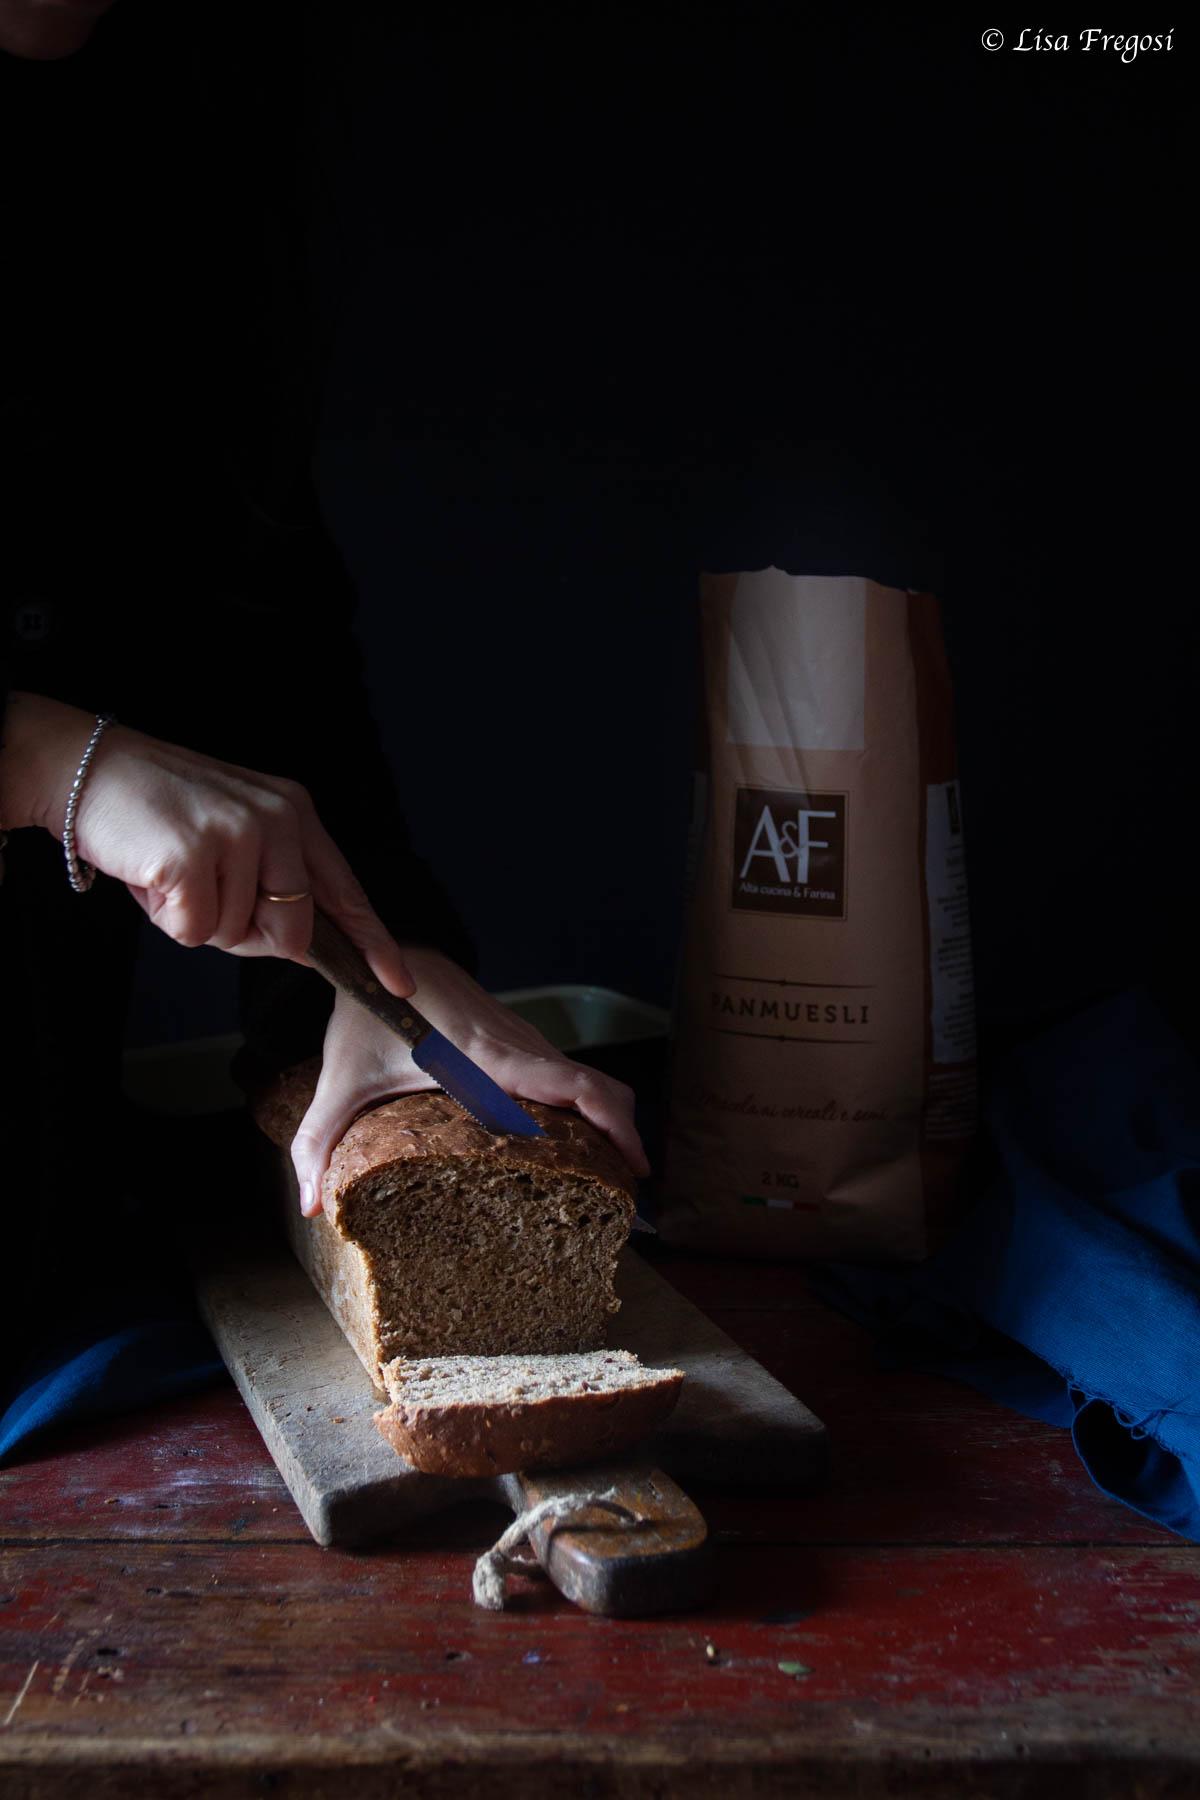 la ricetta del pan muesli